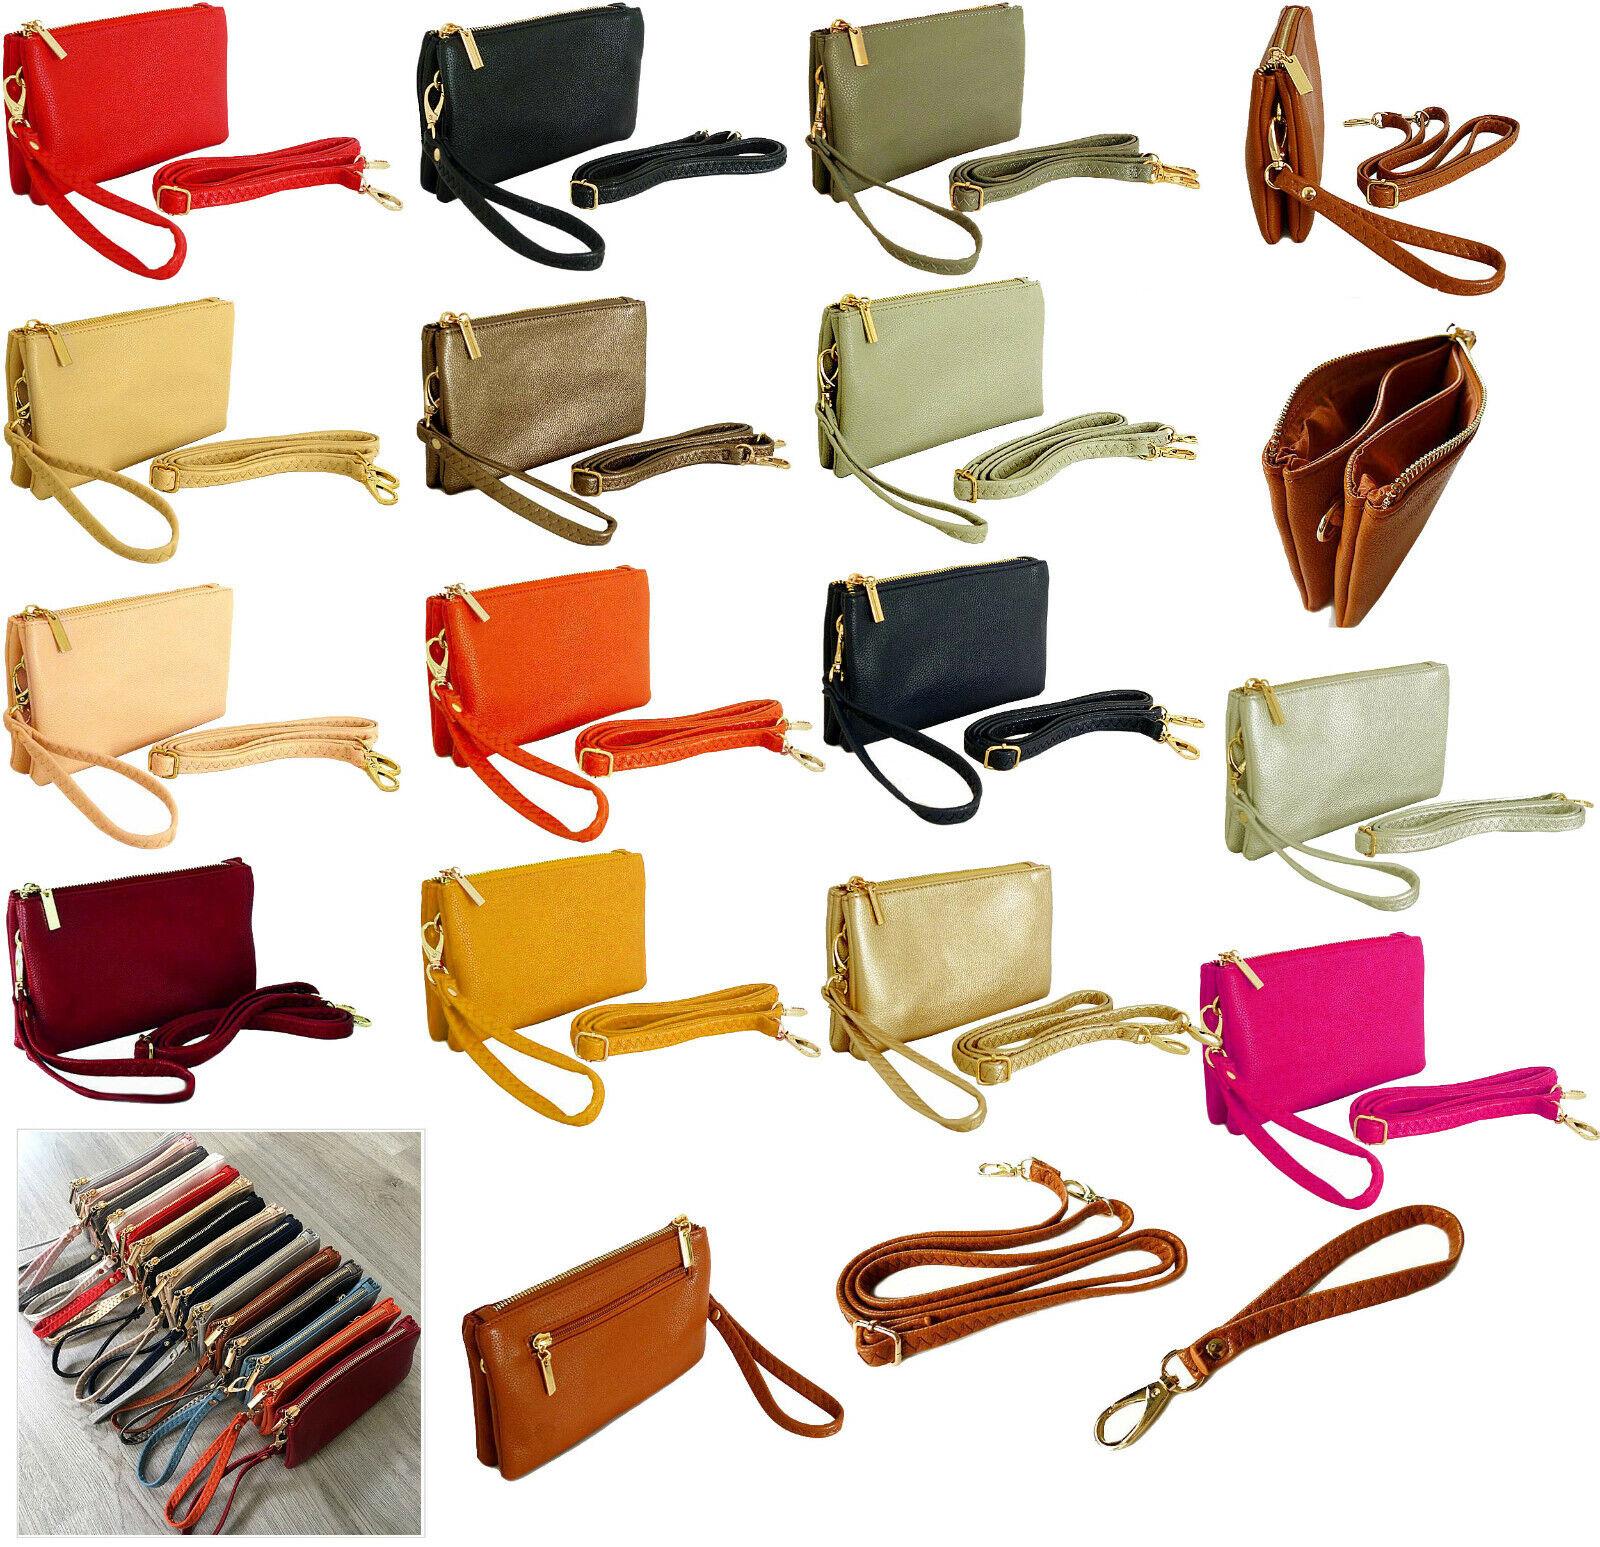 Small Clutch Bag Over Shoulder Bag Crossbody Plain Purse Multi Compartment Strap